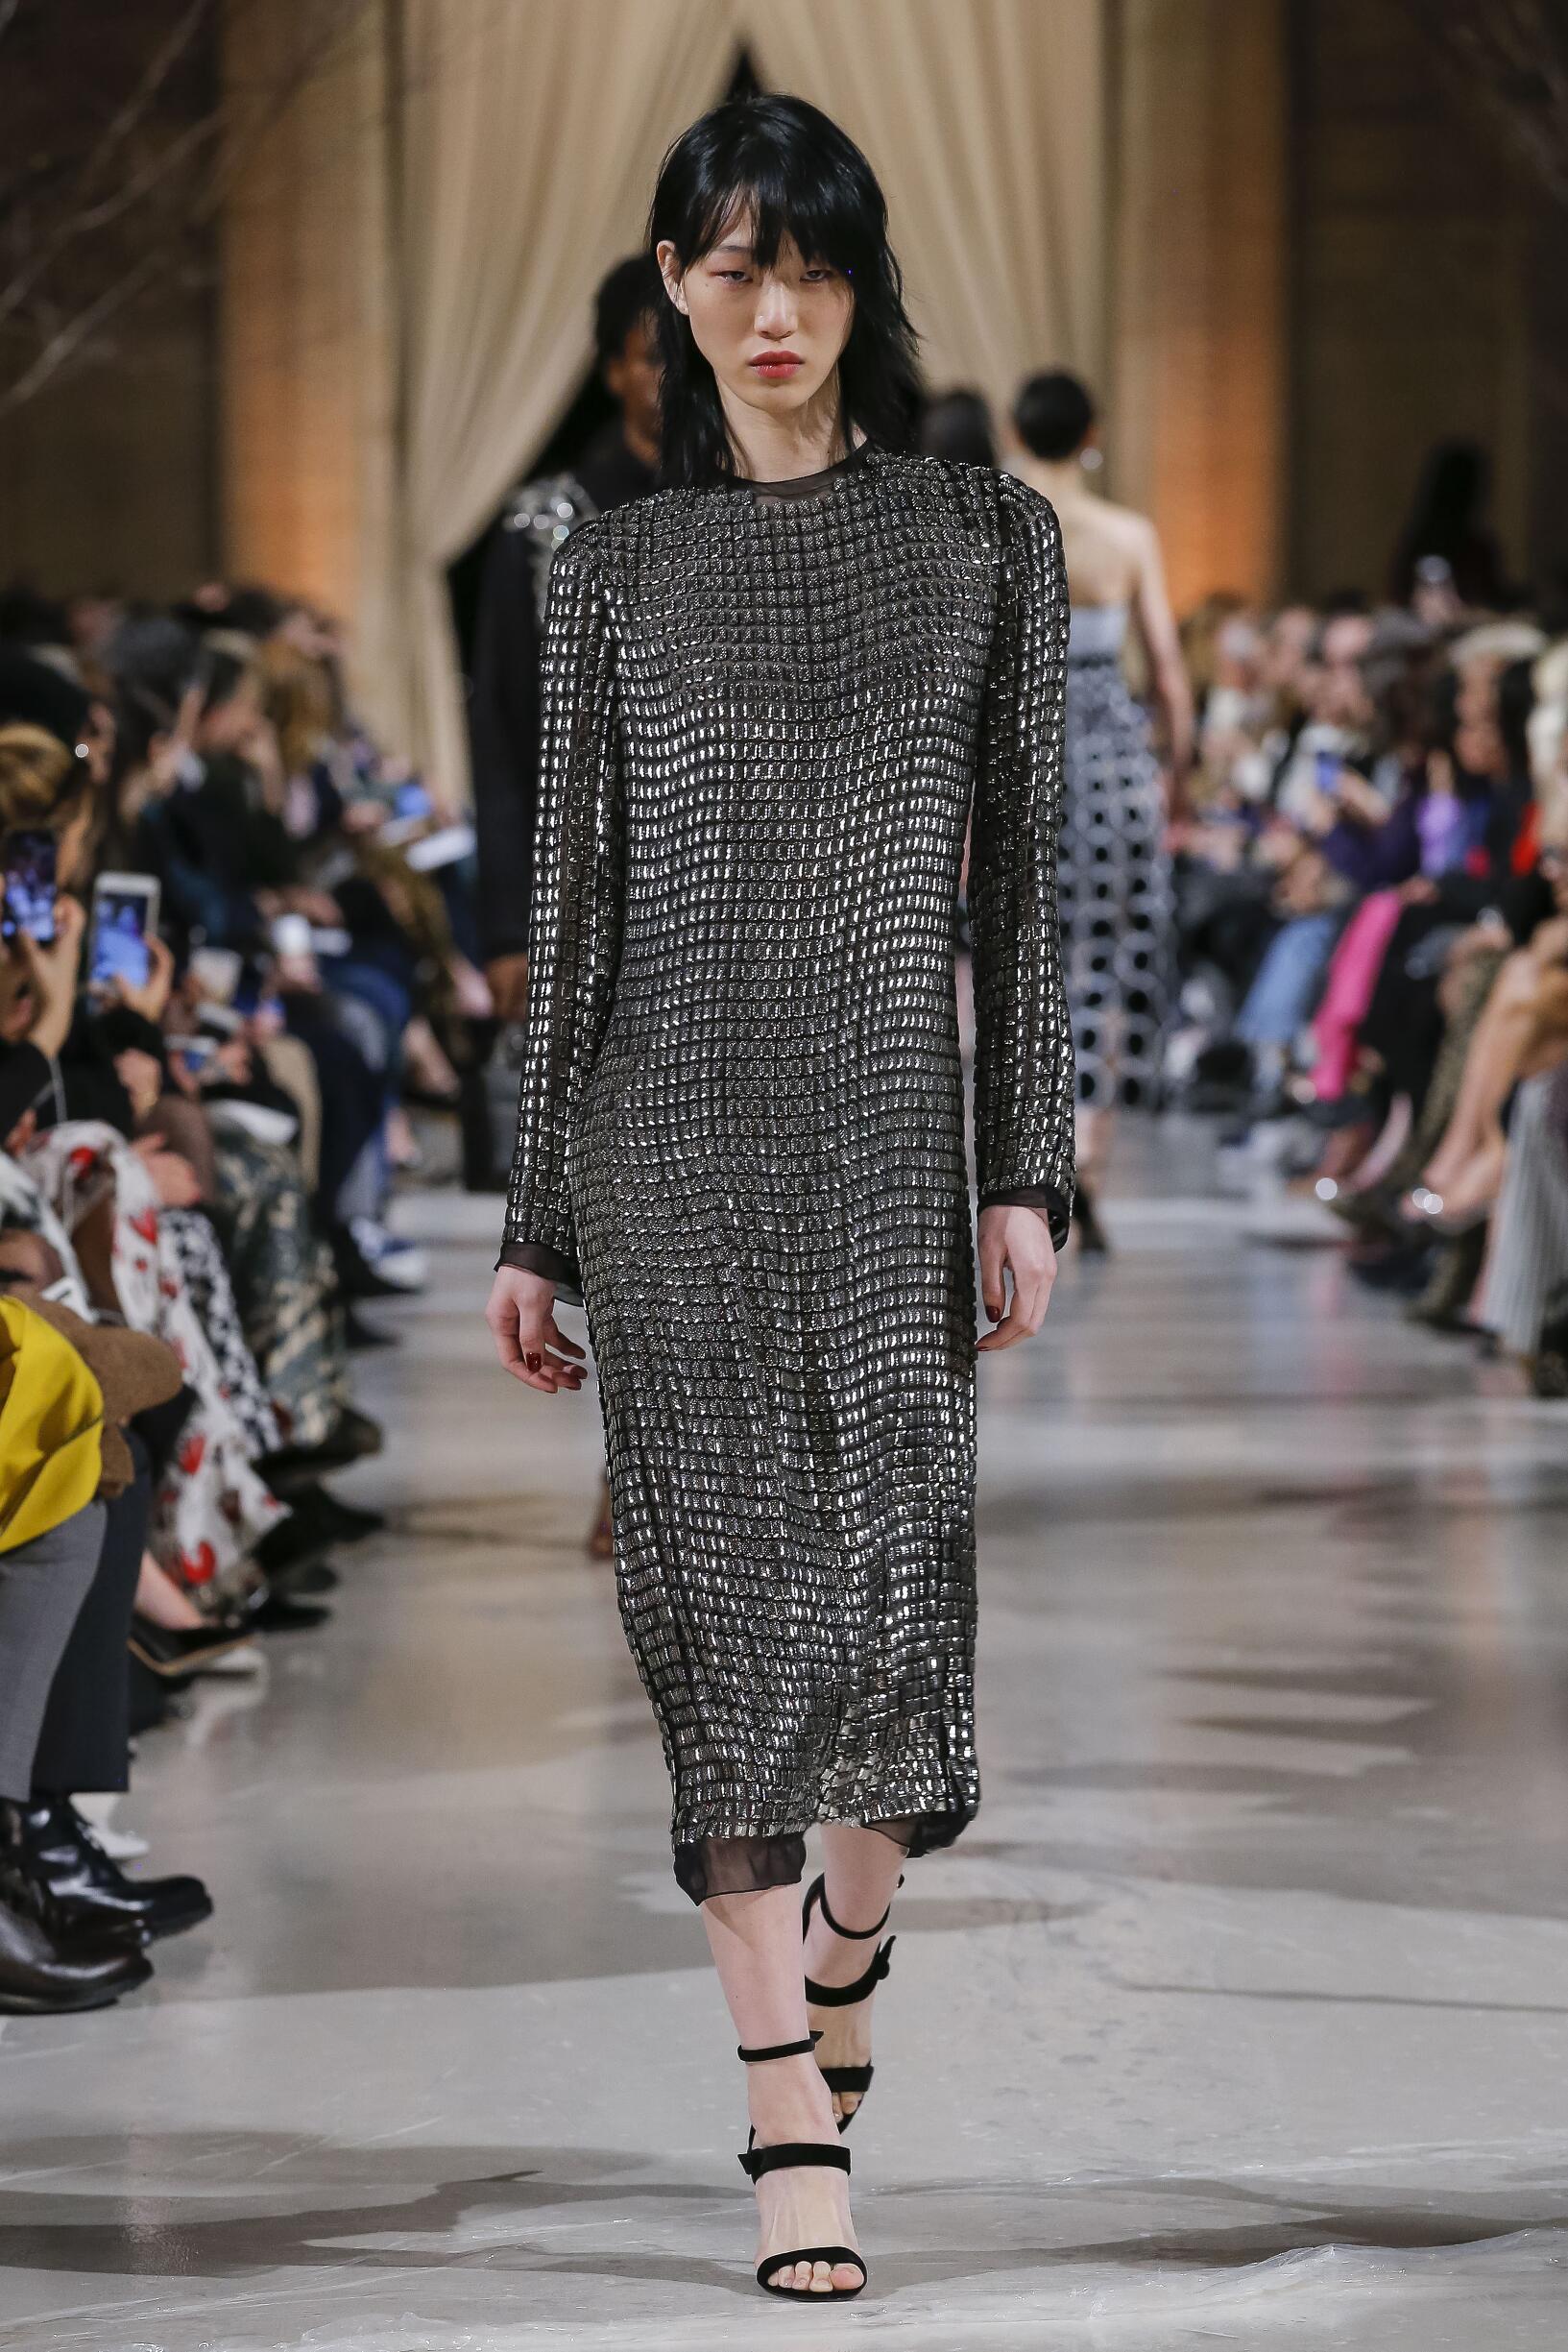 Fashion 2018-19 Woman Trends Oscar de la Renta